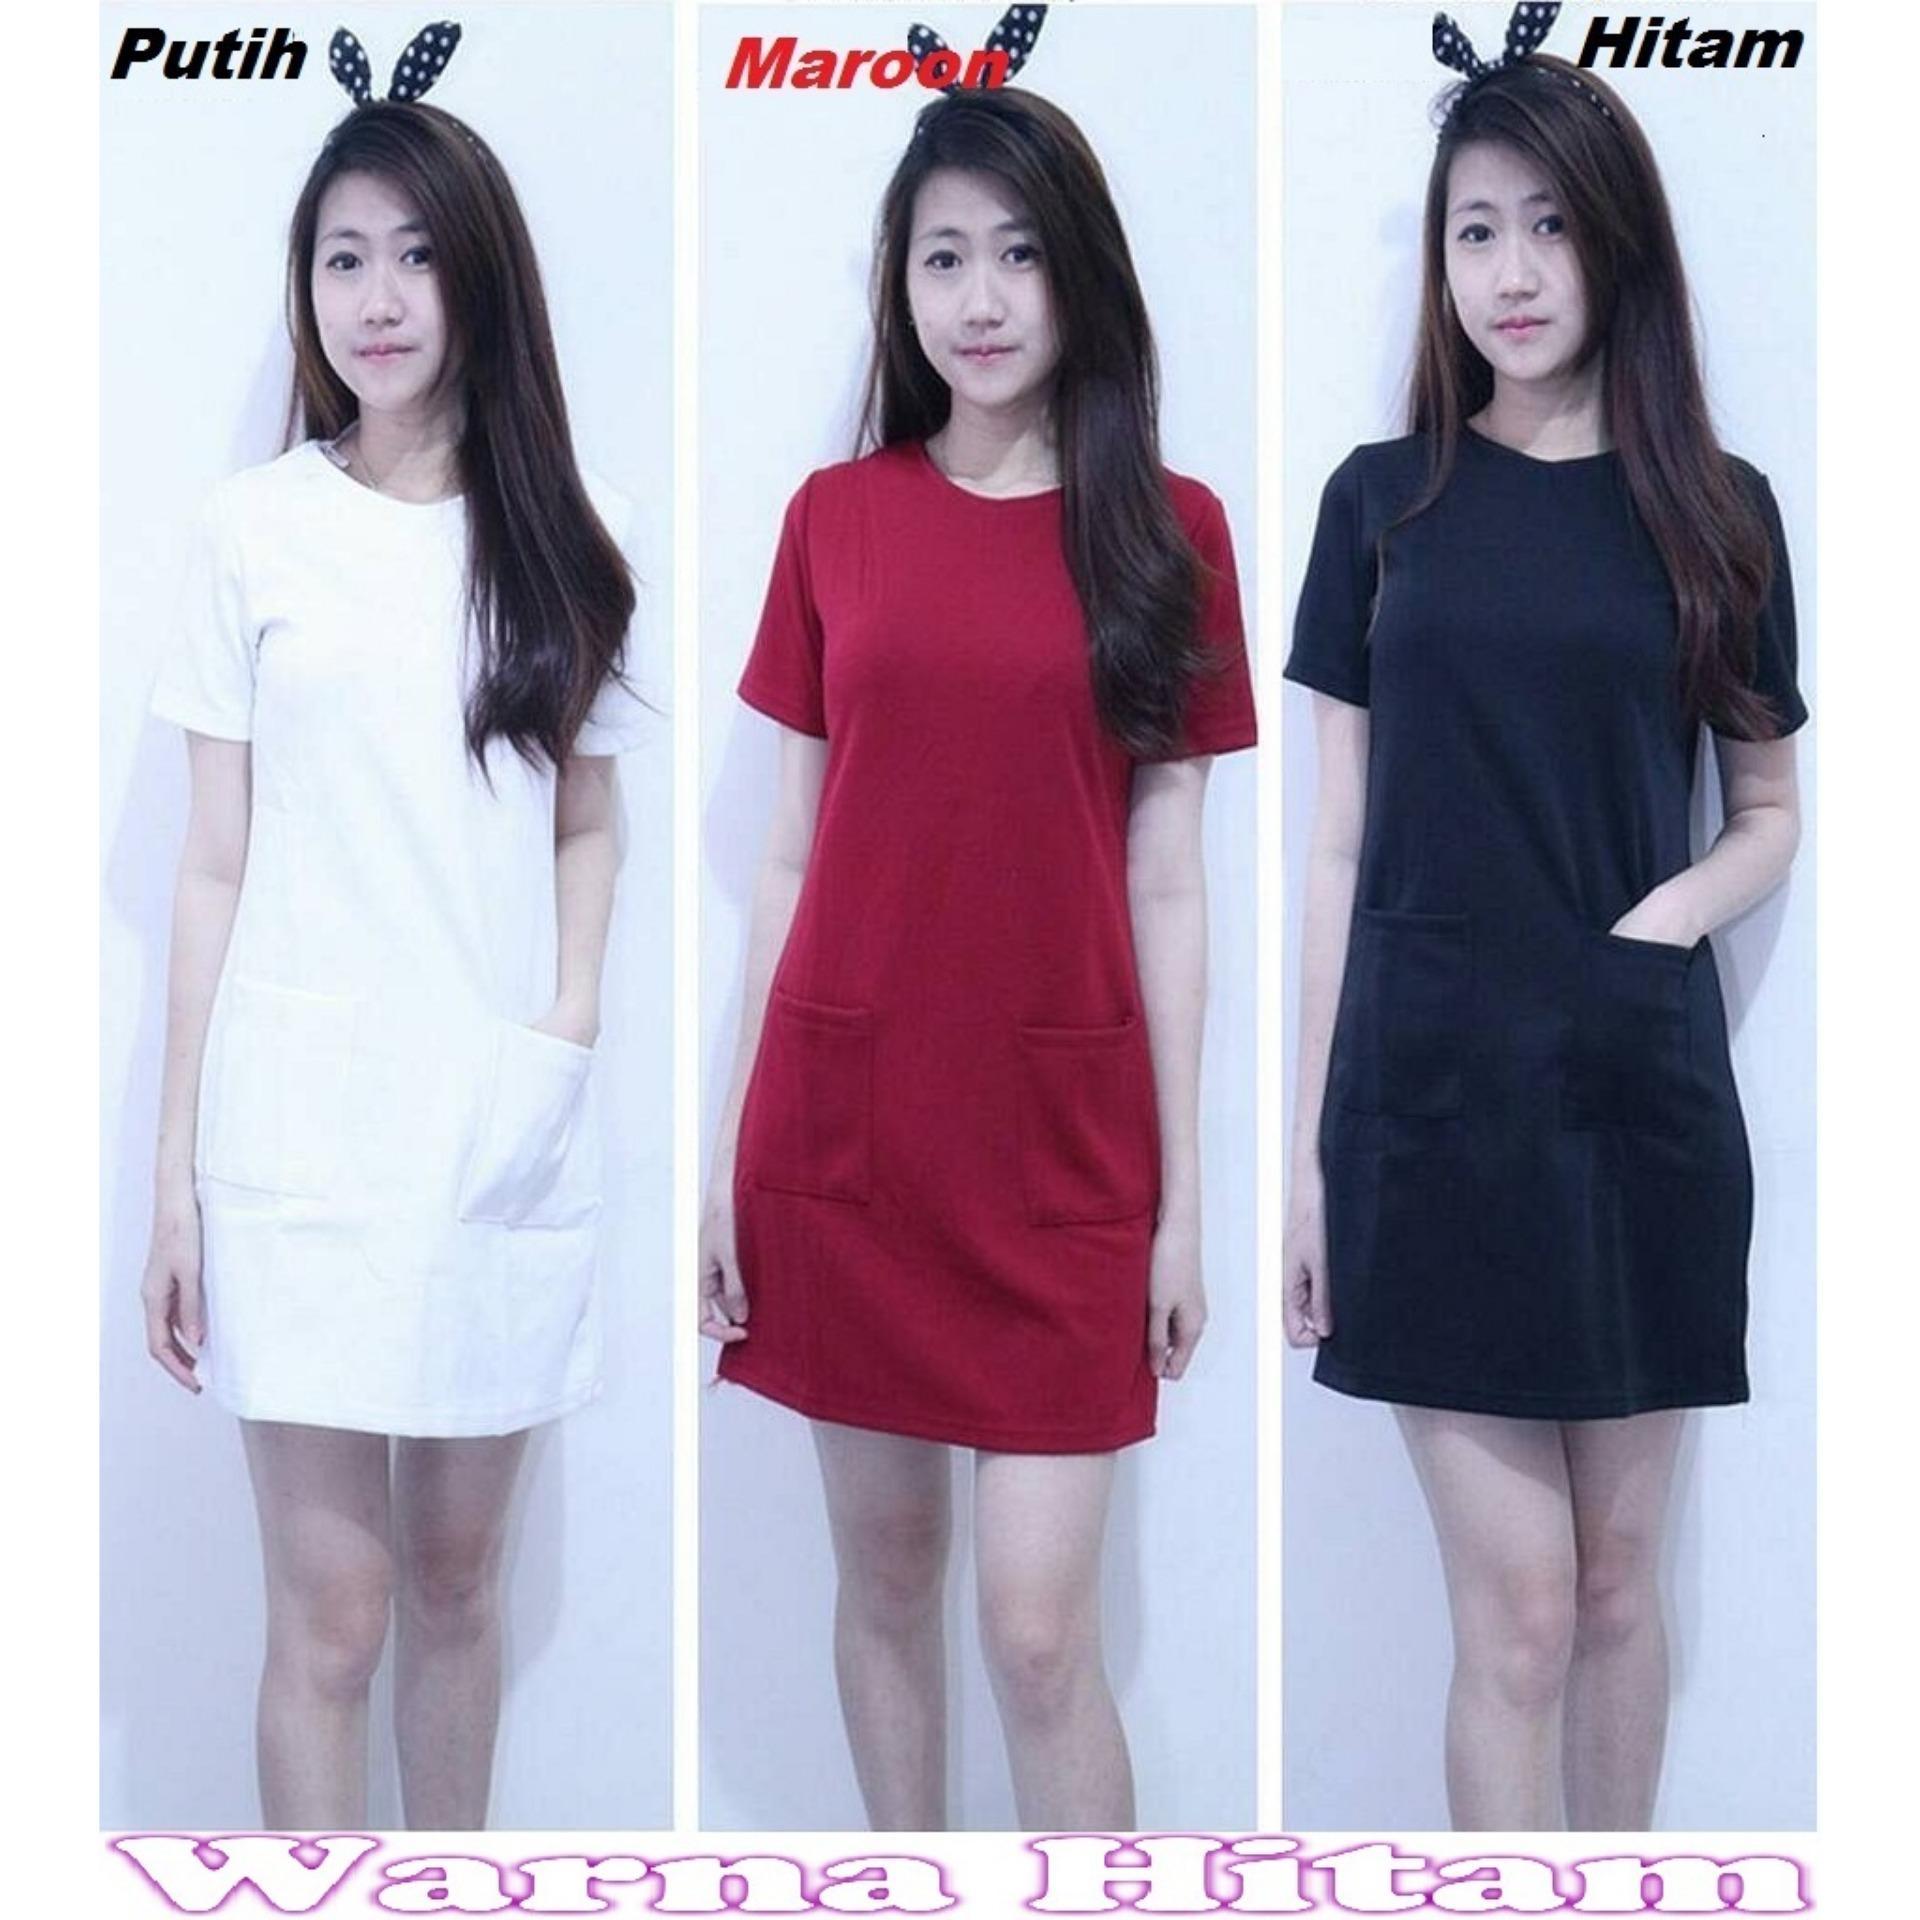 Popuri Fashion Baju Dress Rachell Wanita - Scuba Lengan Pendek - Hitam